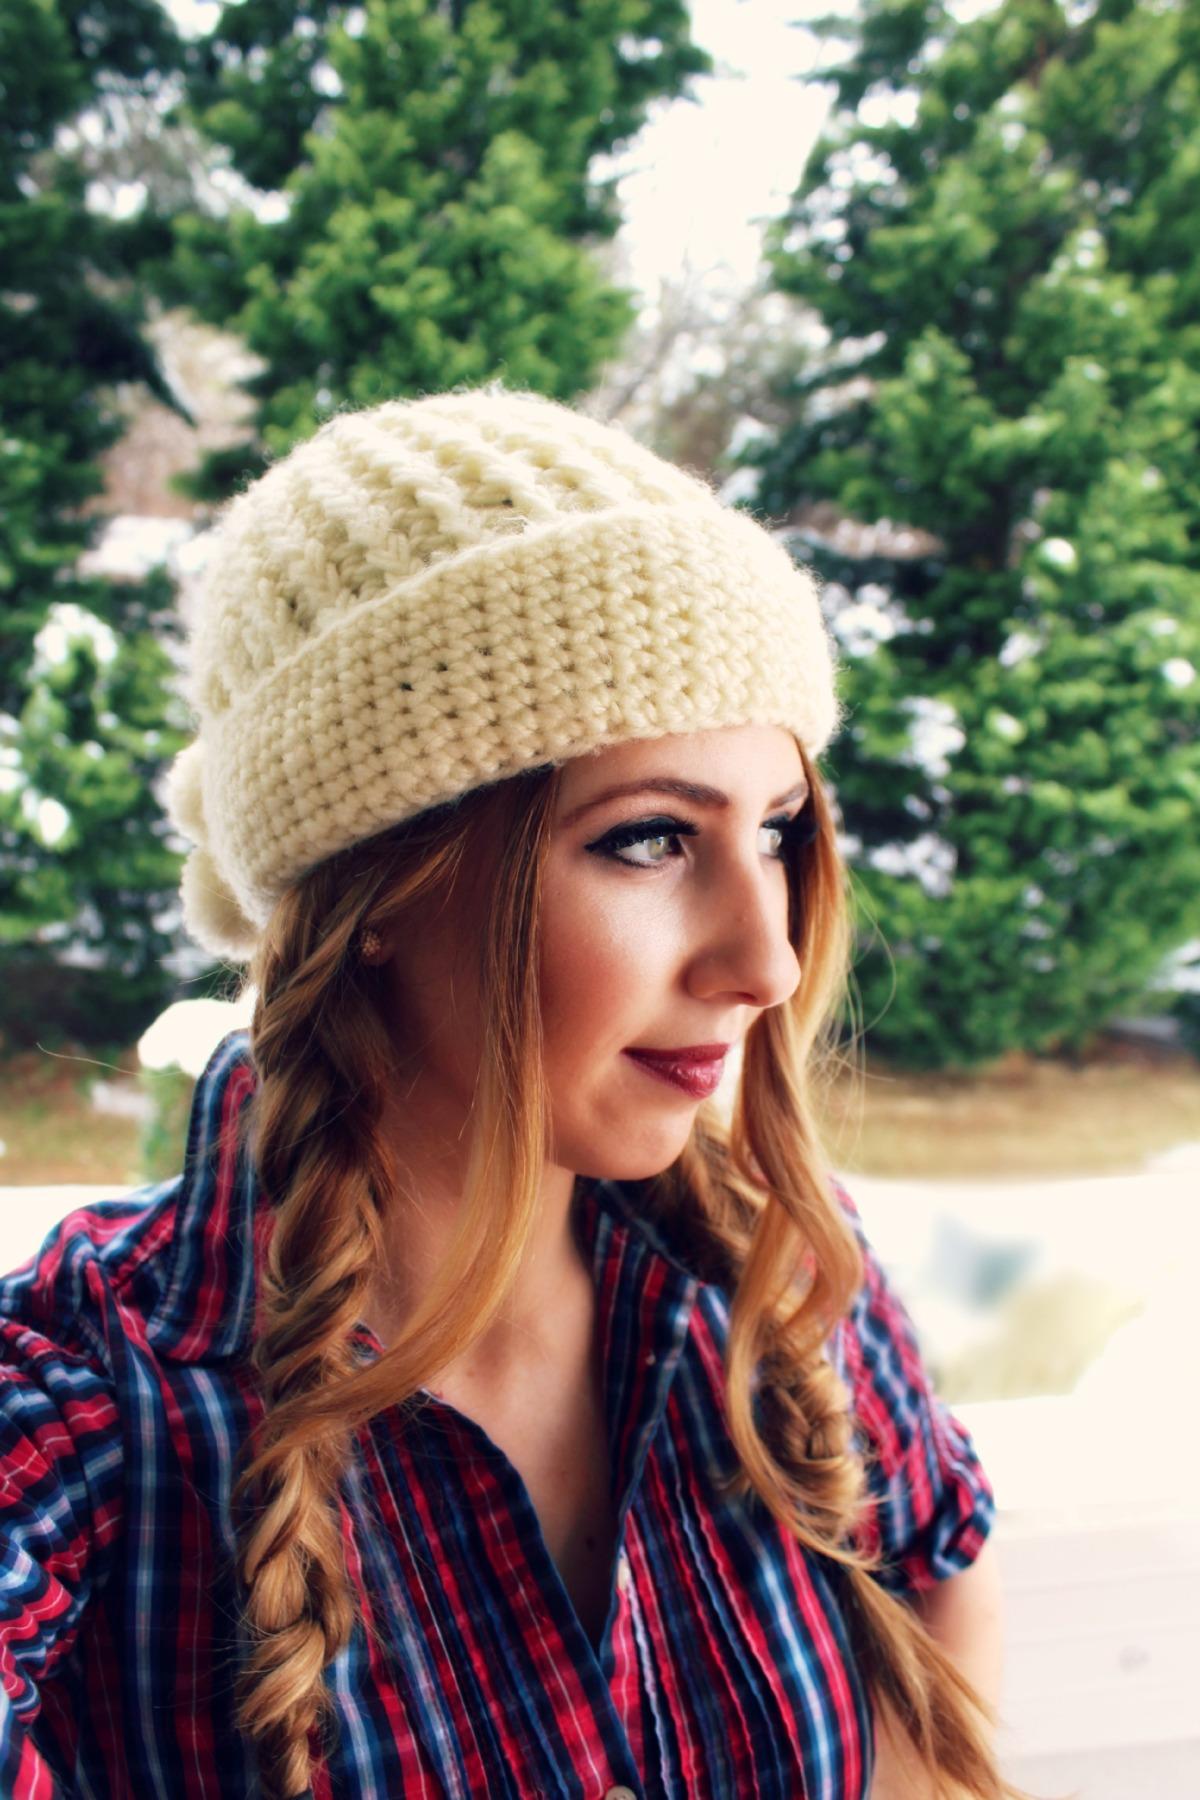 snow day - Joanna 0795846+